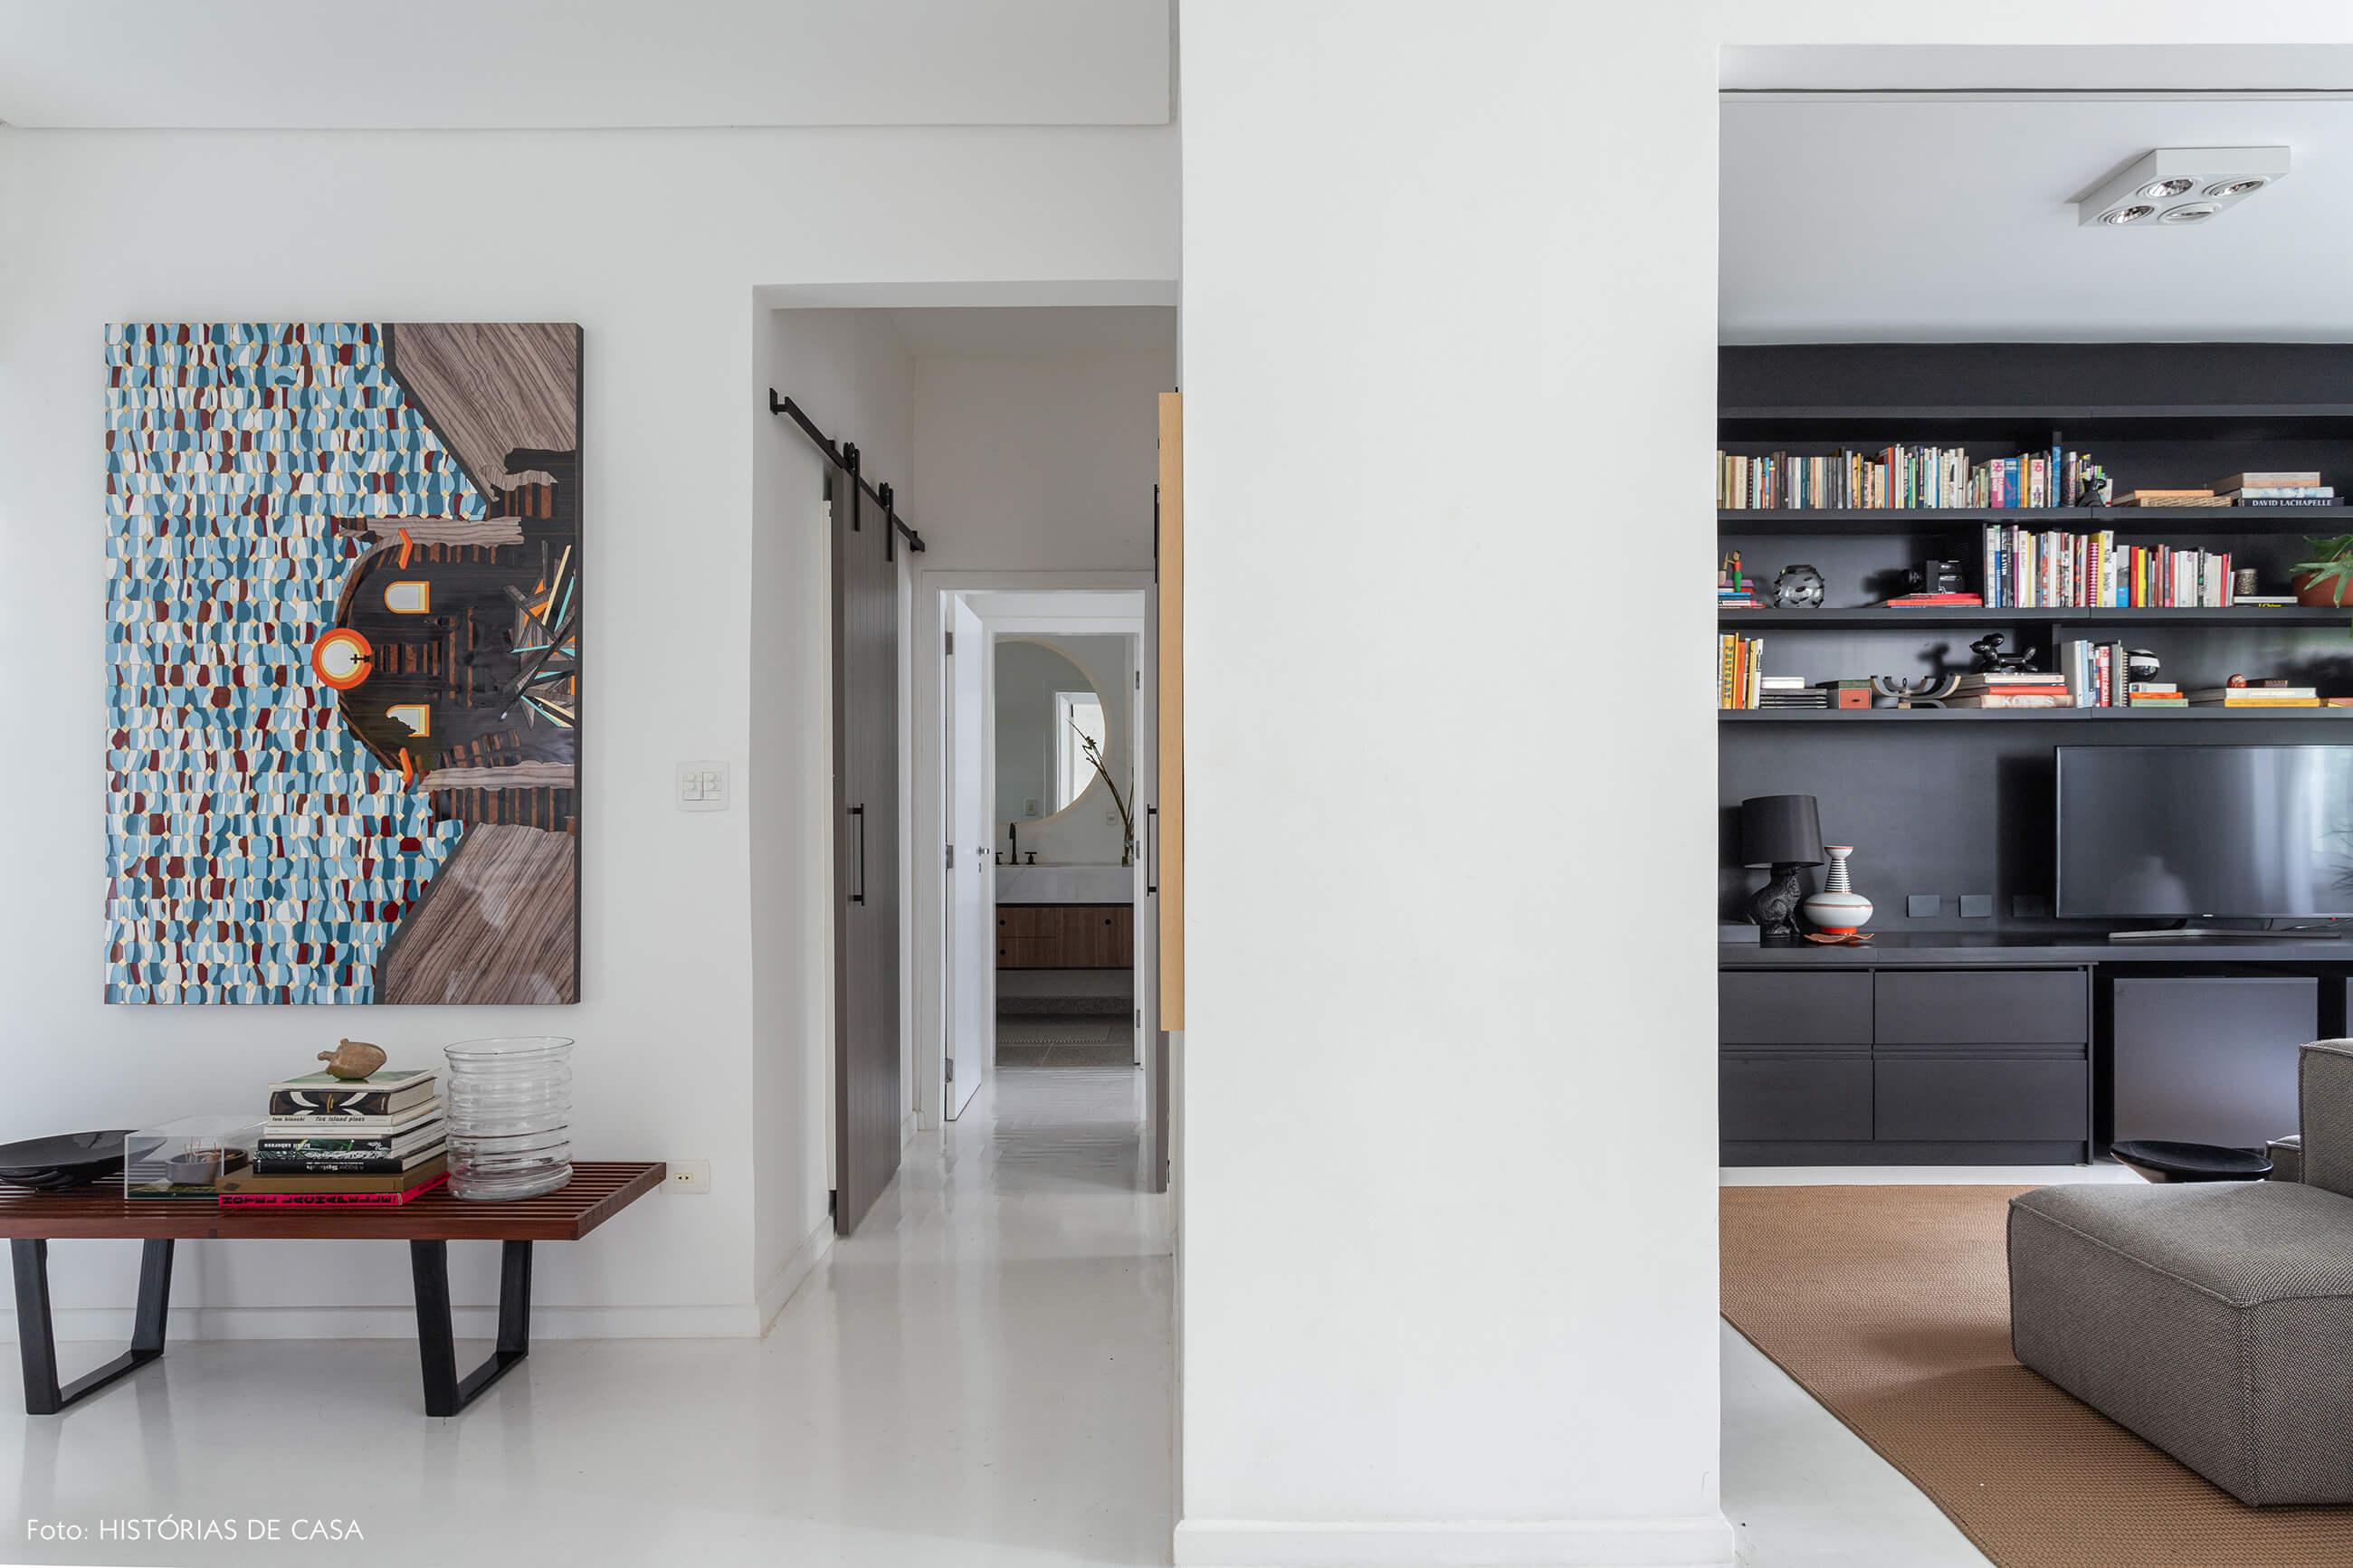 Apartamento escandinavo, sala com piso de tacos pintado de branco